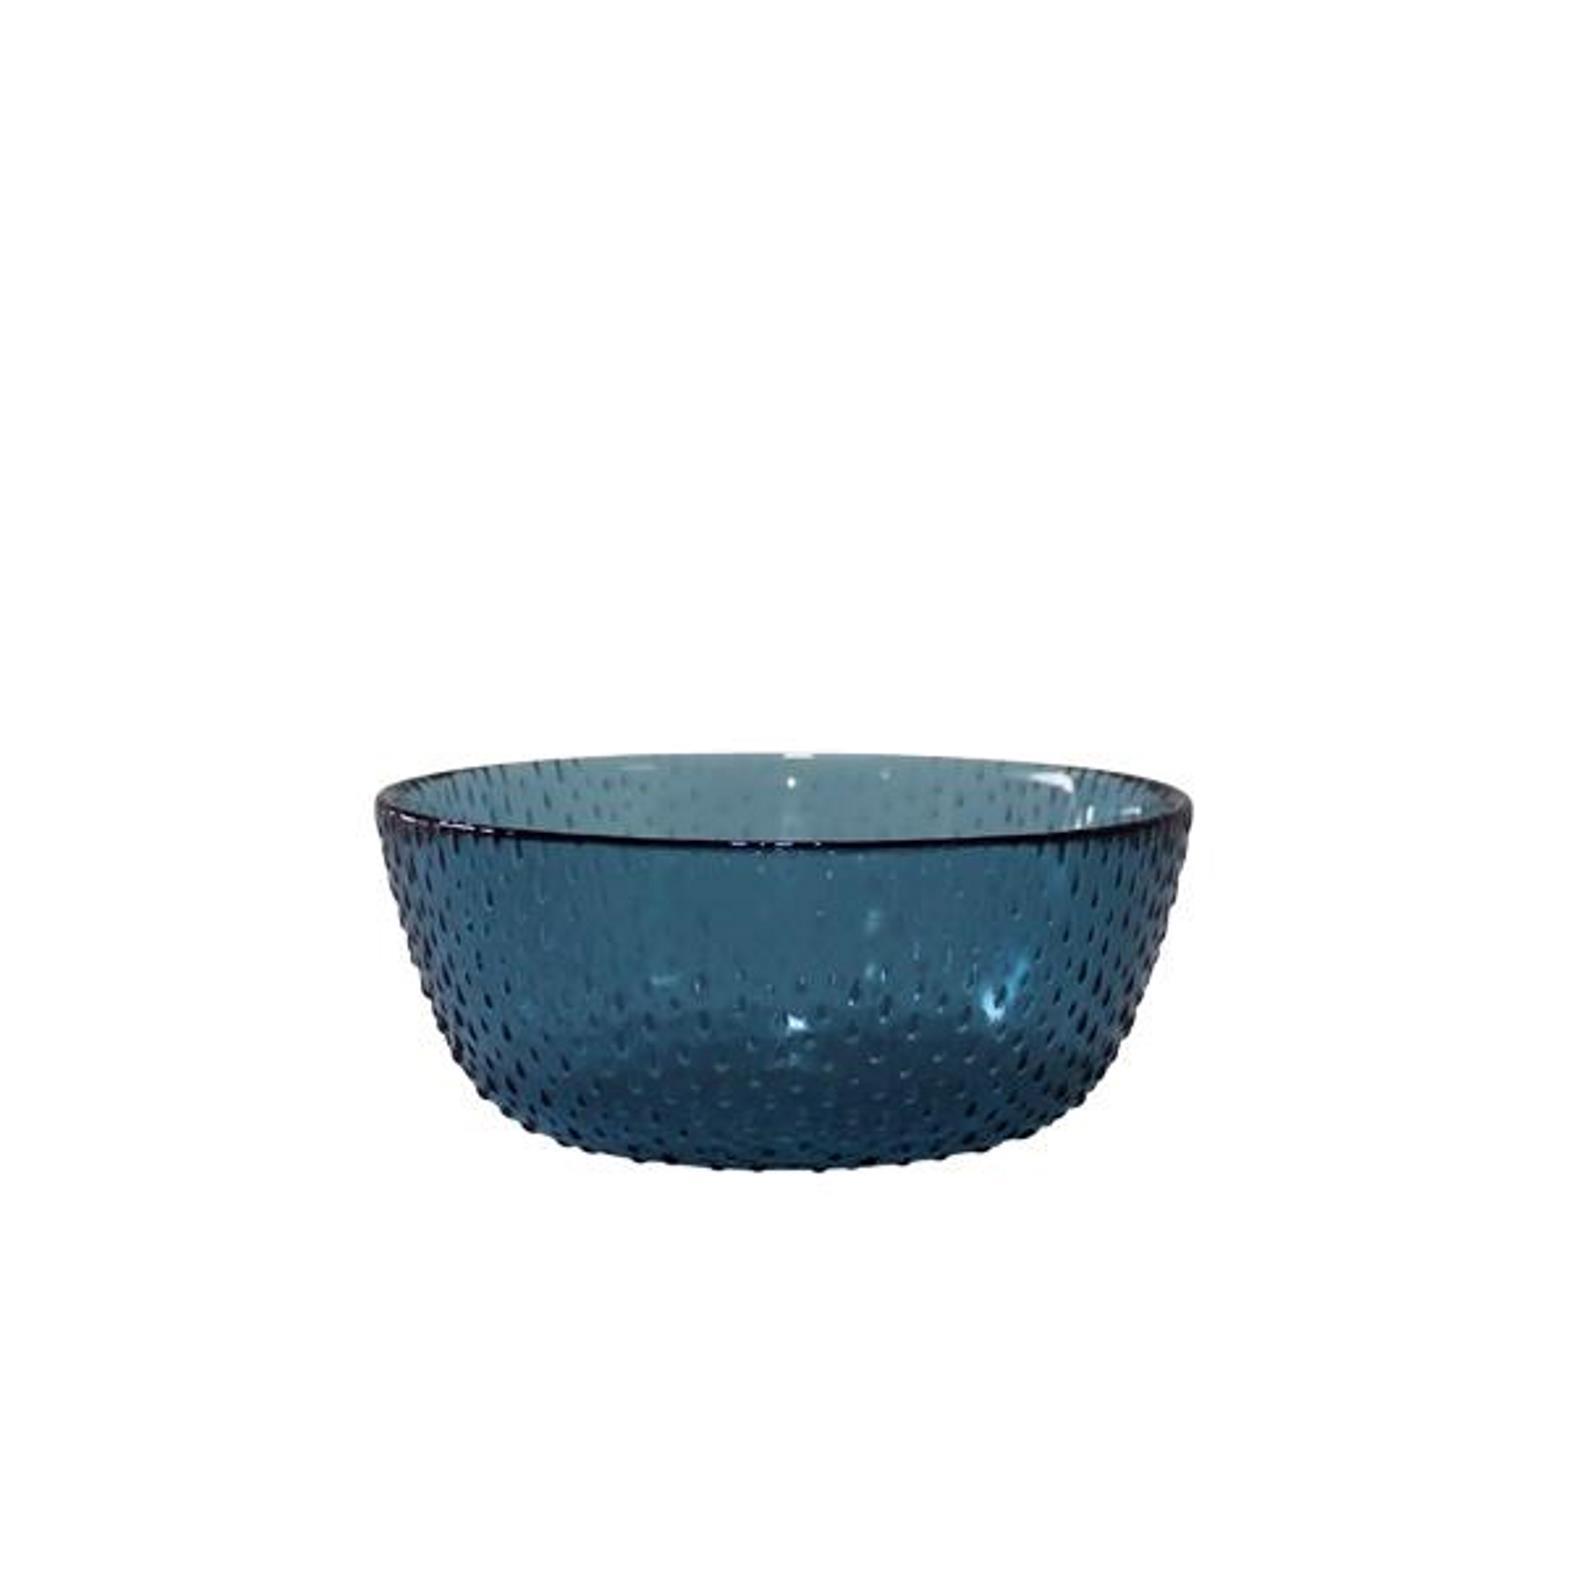 Онлайн каталог PROMENU: Пиала Aida RAW, диаметр 20,5 см, высота 8 см, прозрачный синий                               15075